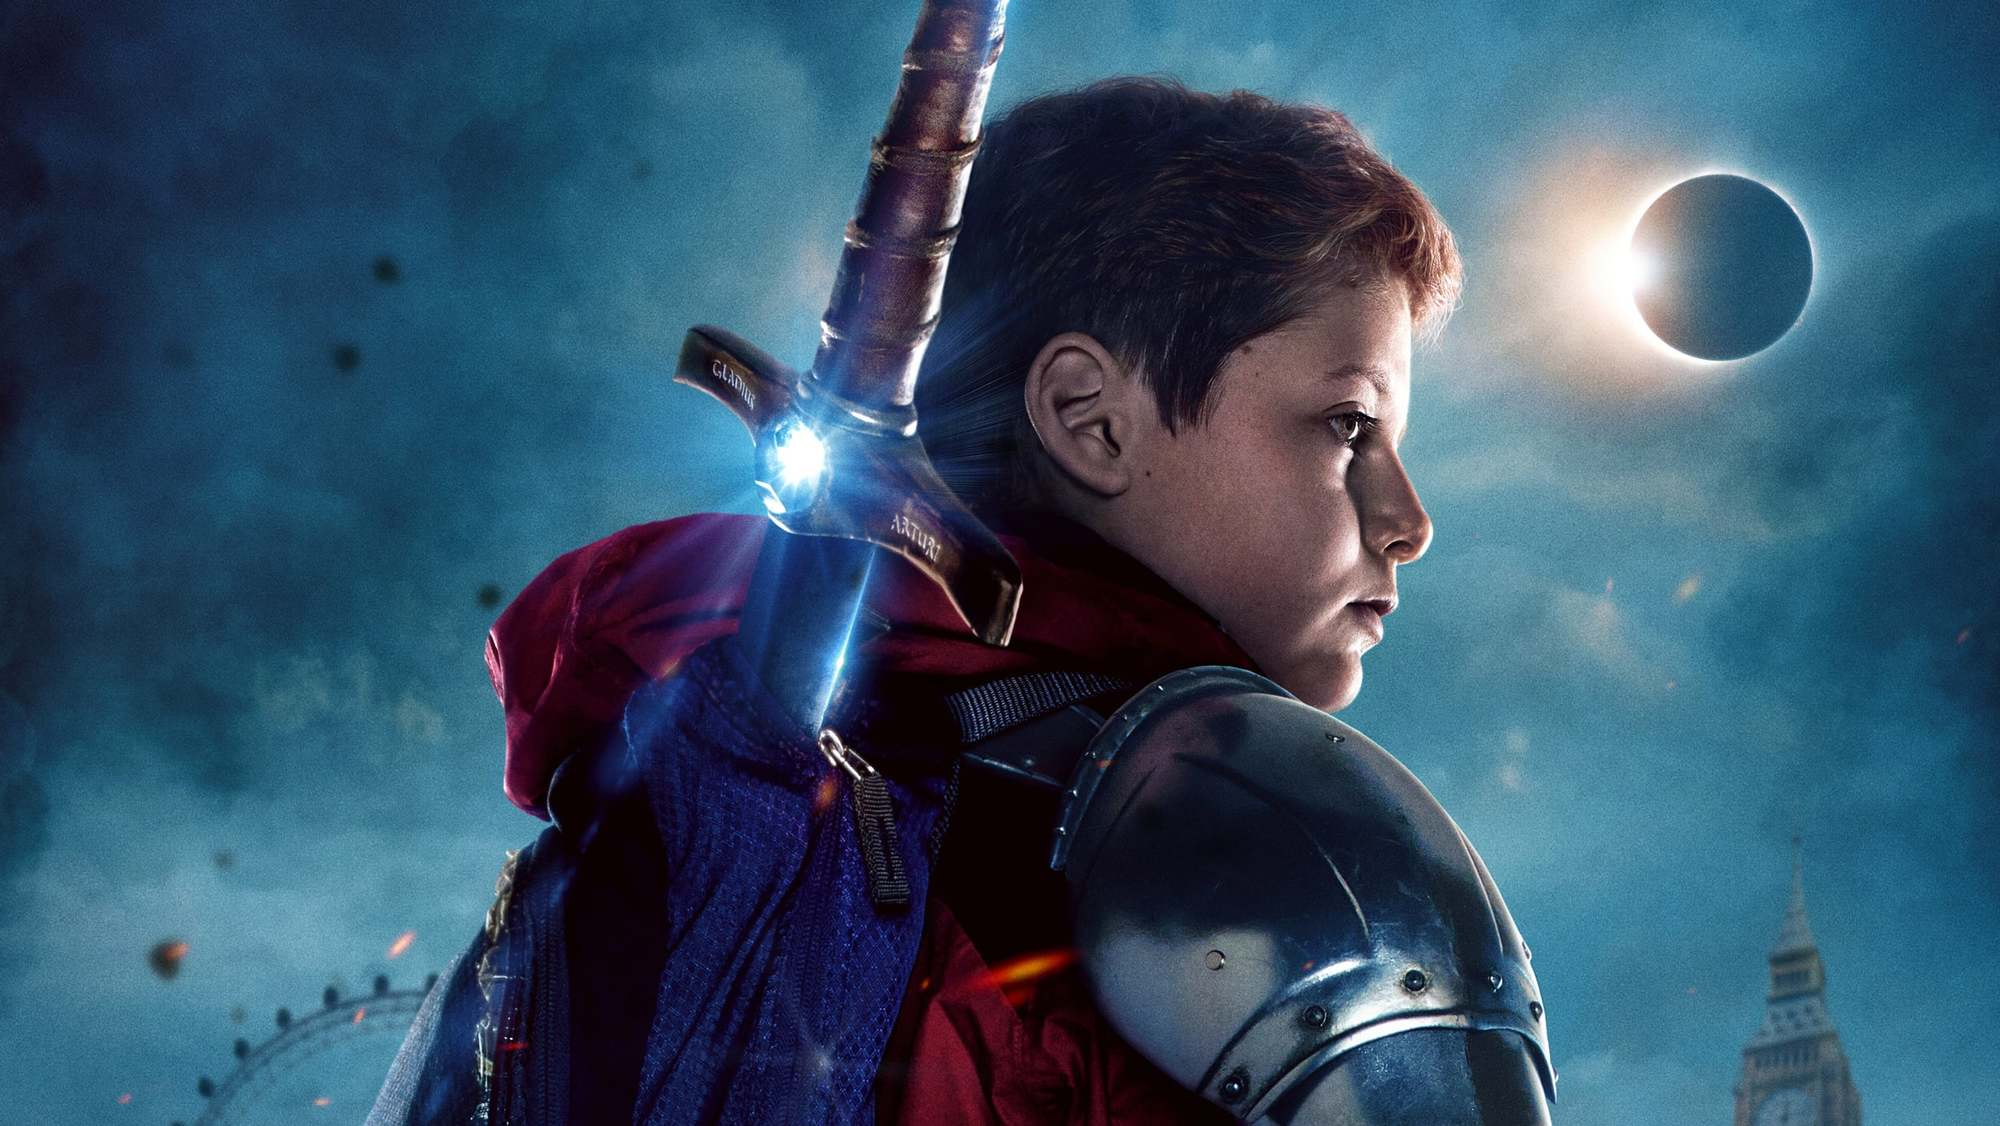 Image: The Kid Who Would Be King/TMDb